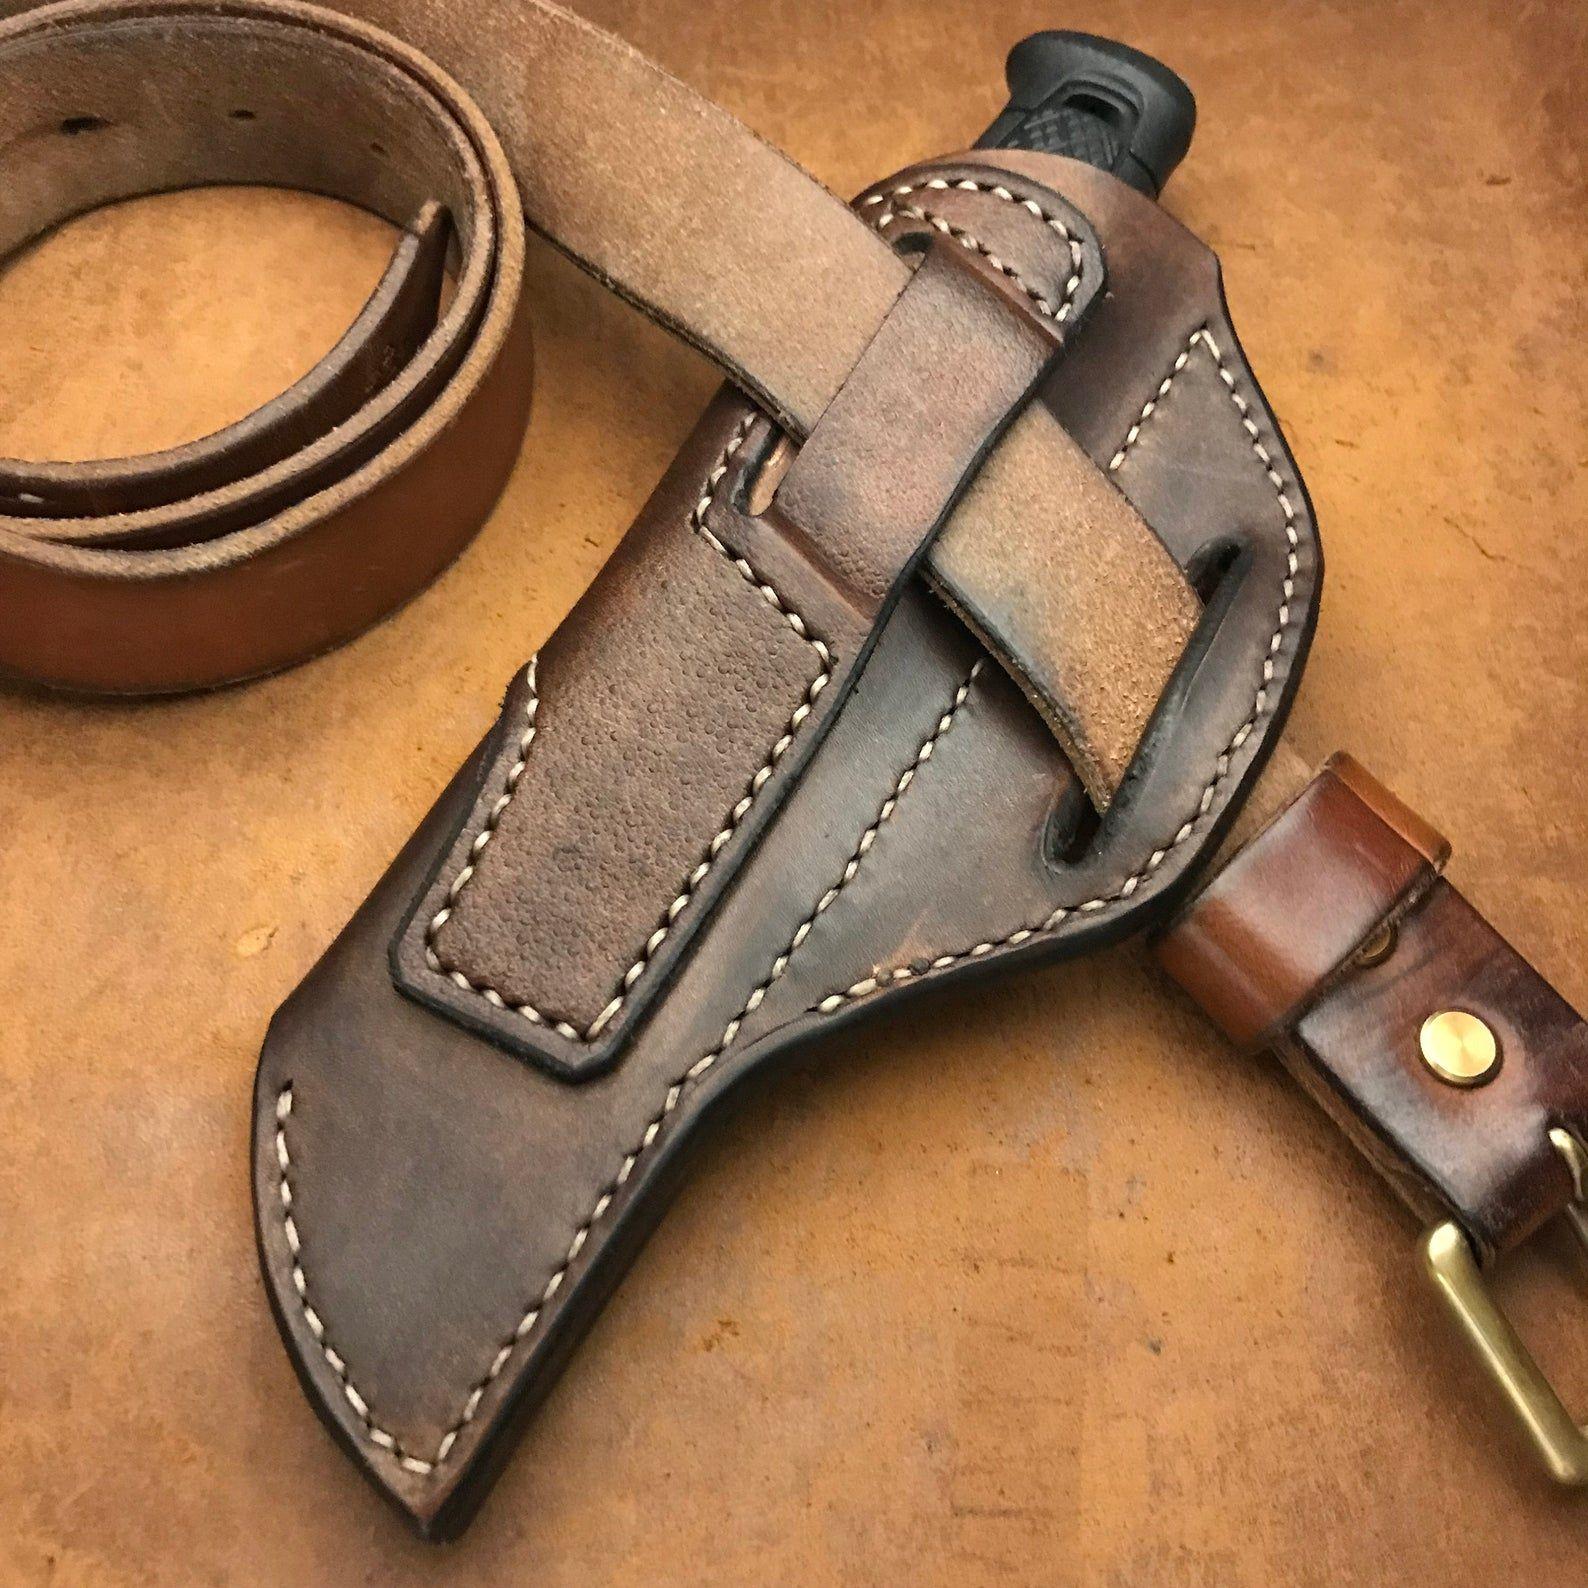 Cross Draw Leather Sheath For Morakniv Garberg Kansbol Ksm04 Leather Holster Knife Sheath Making Leather